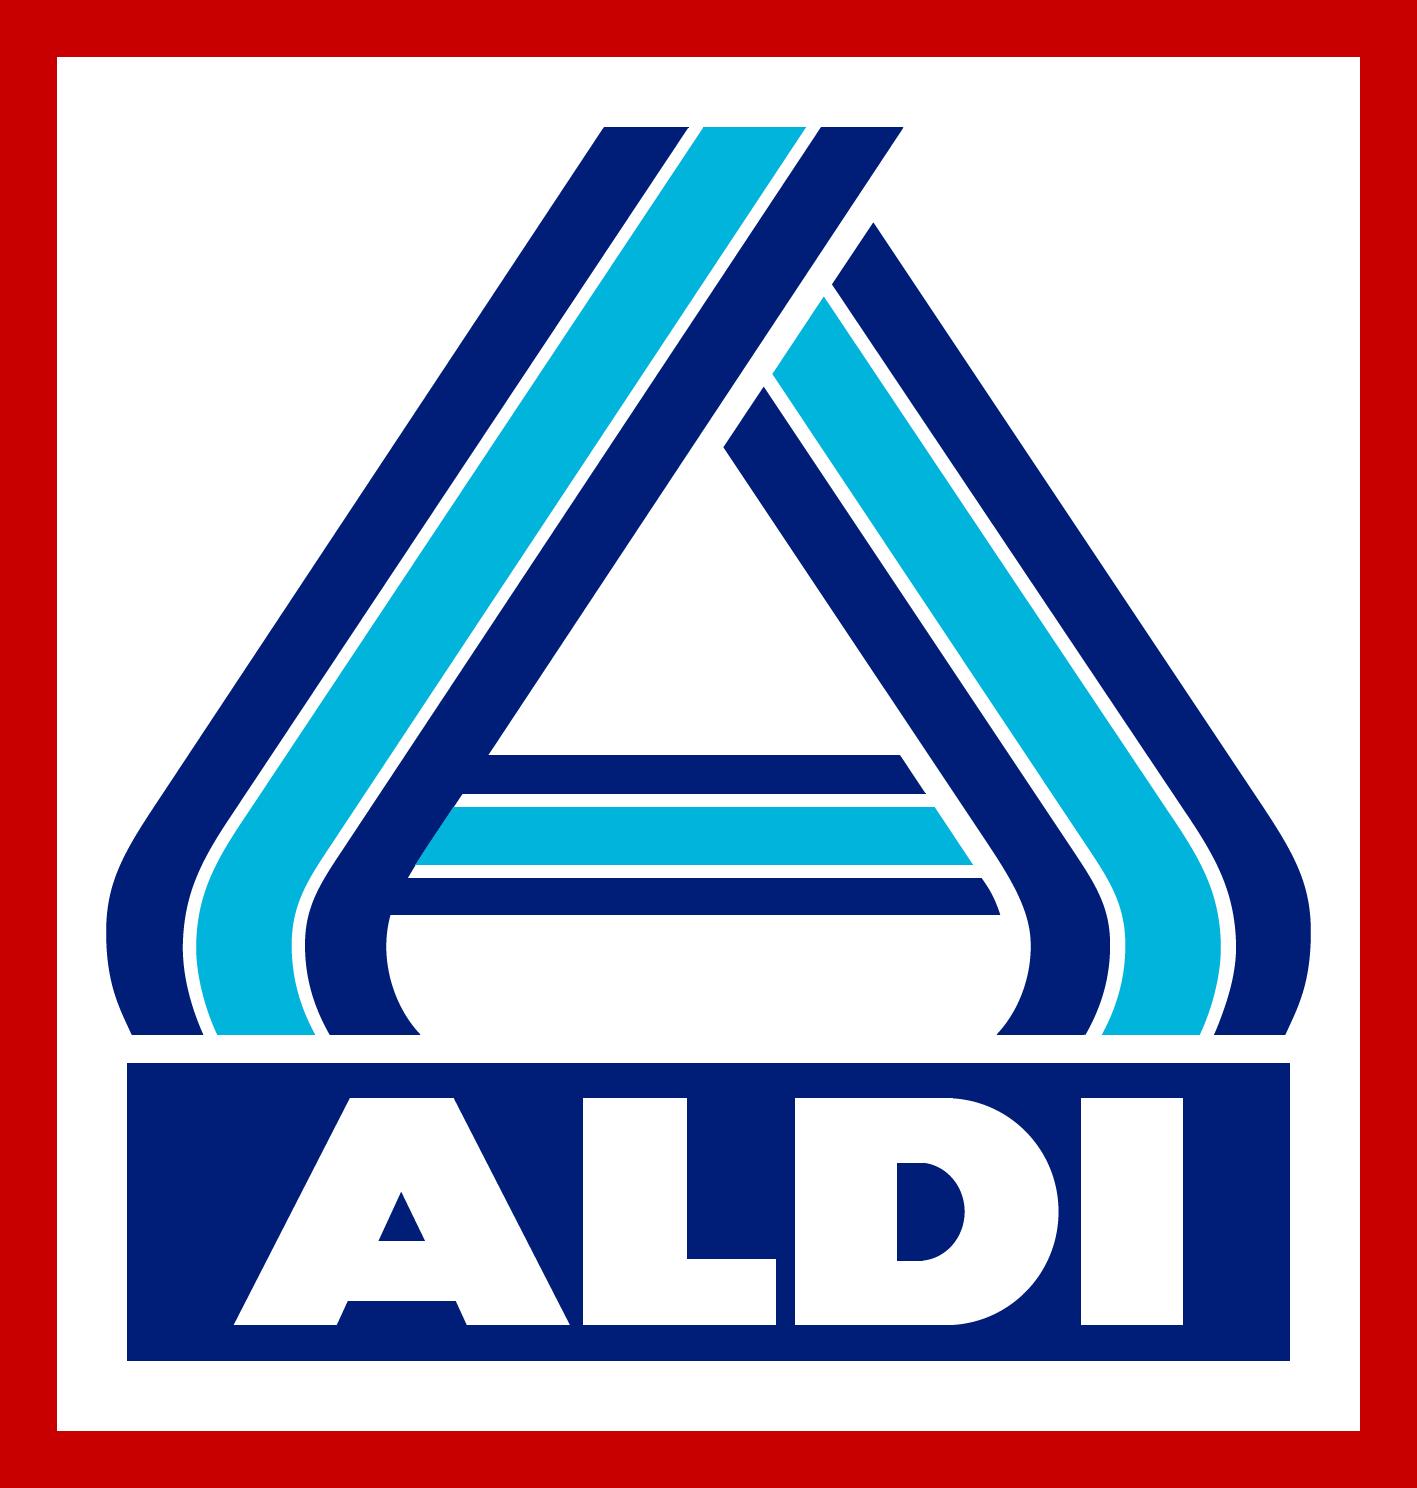 Depiction of Aldi